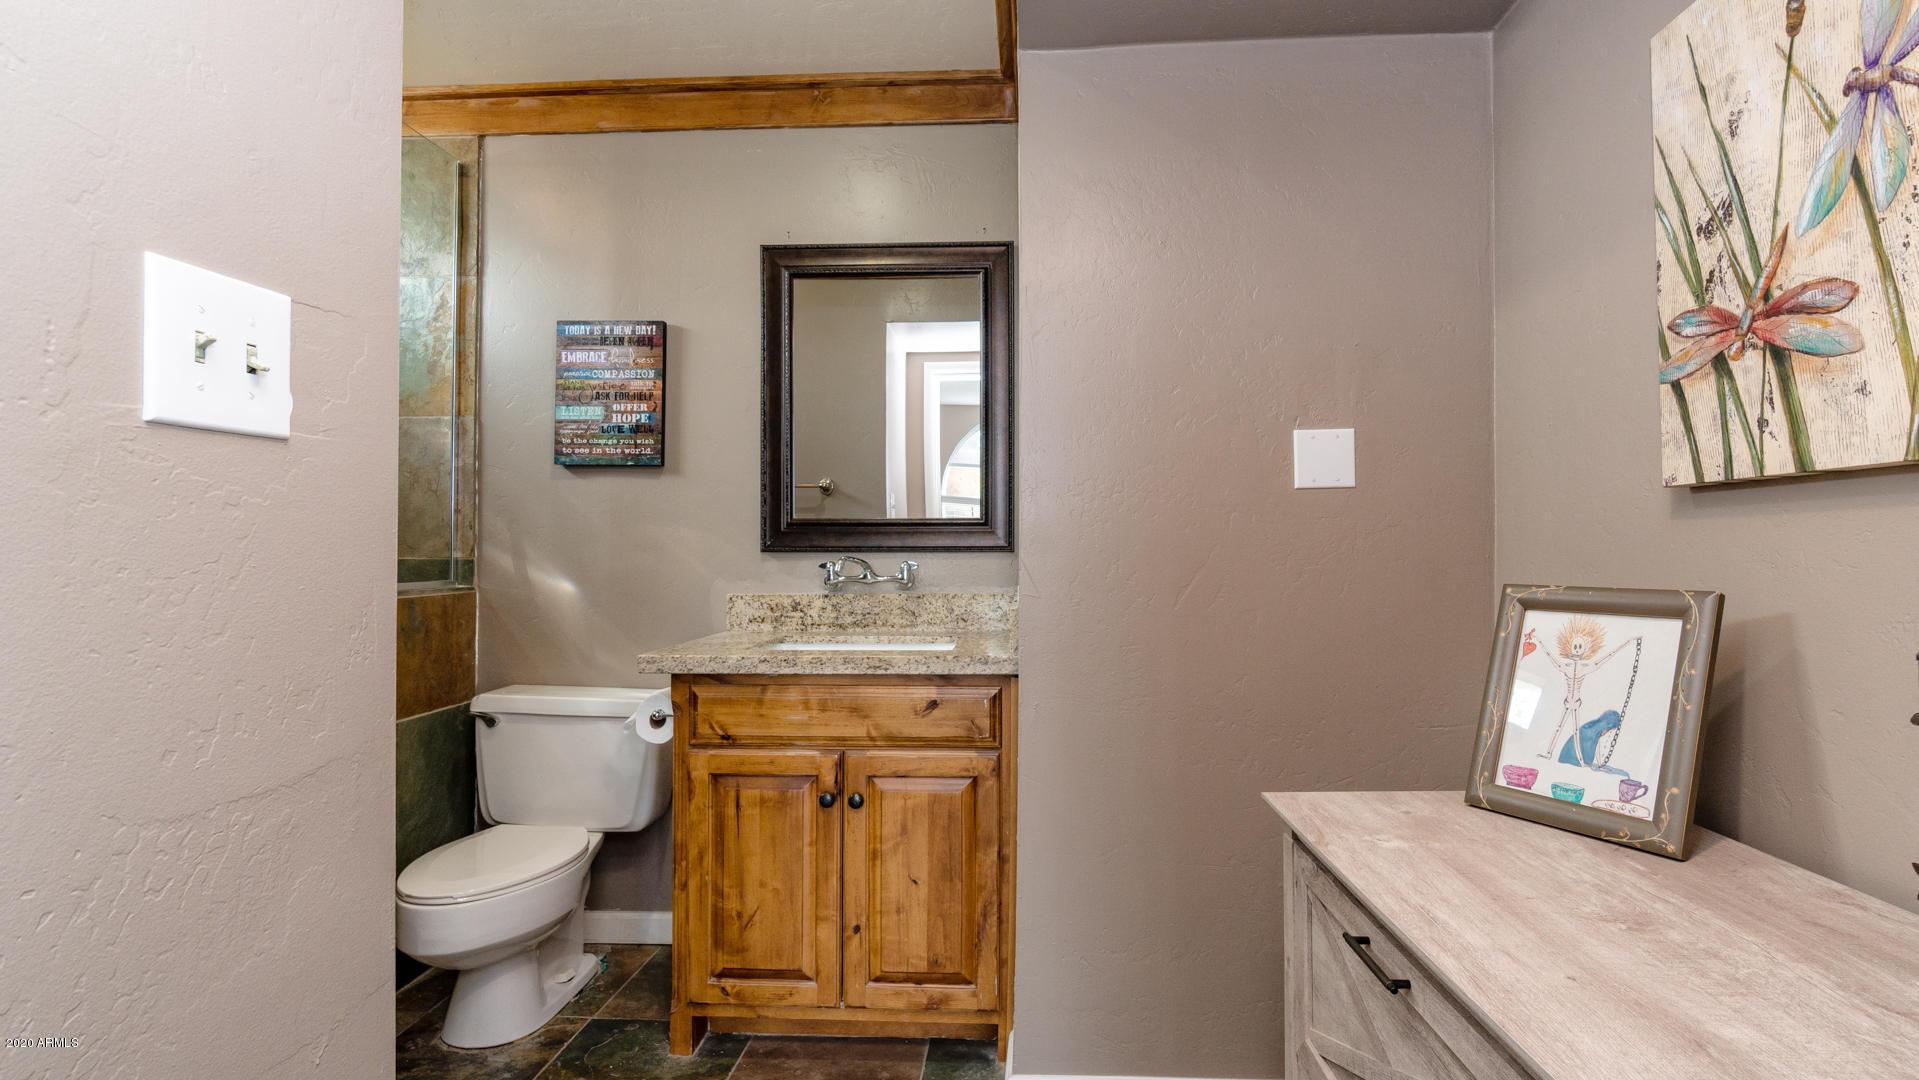 OSBORN Road, Phoenix, Arizona 85016, 3 Bedrooms Bedrooms, ,3 BathroomsBathrooms,Residential,For Sale,OSBORN,6135324